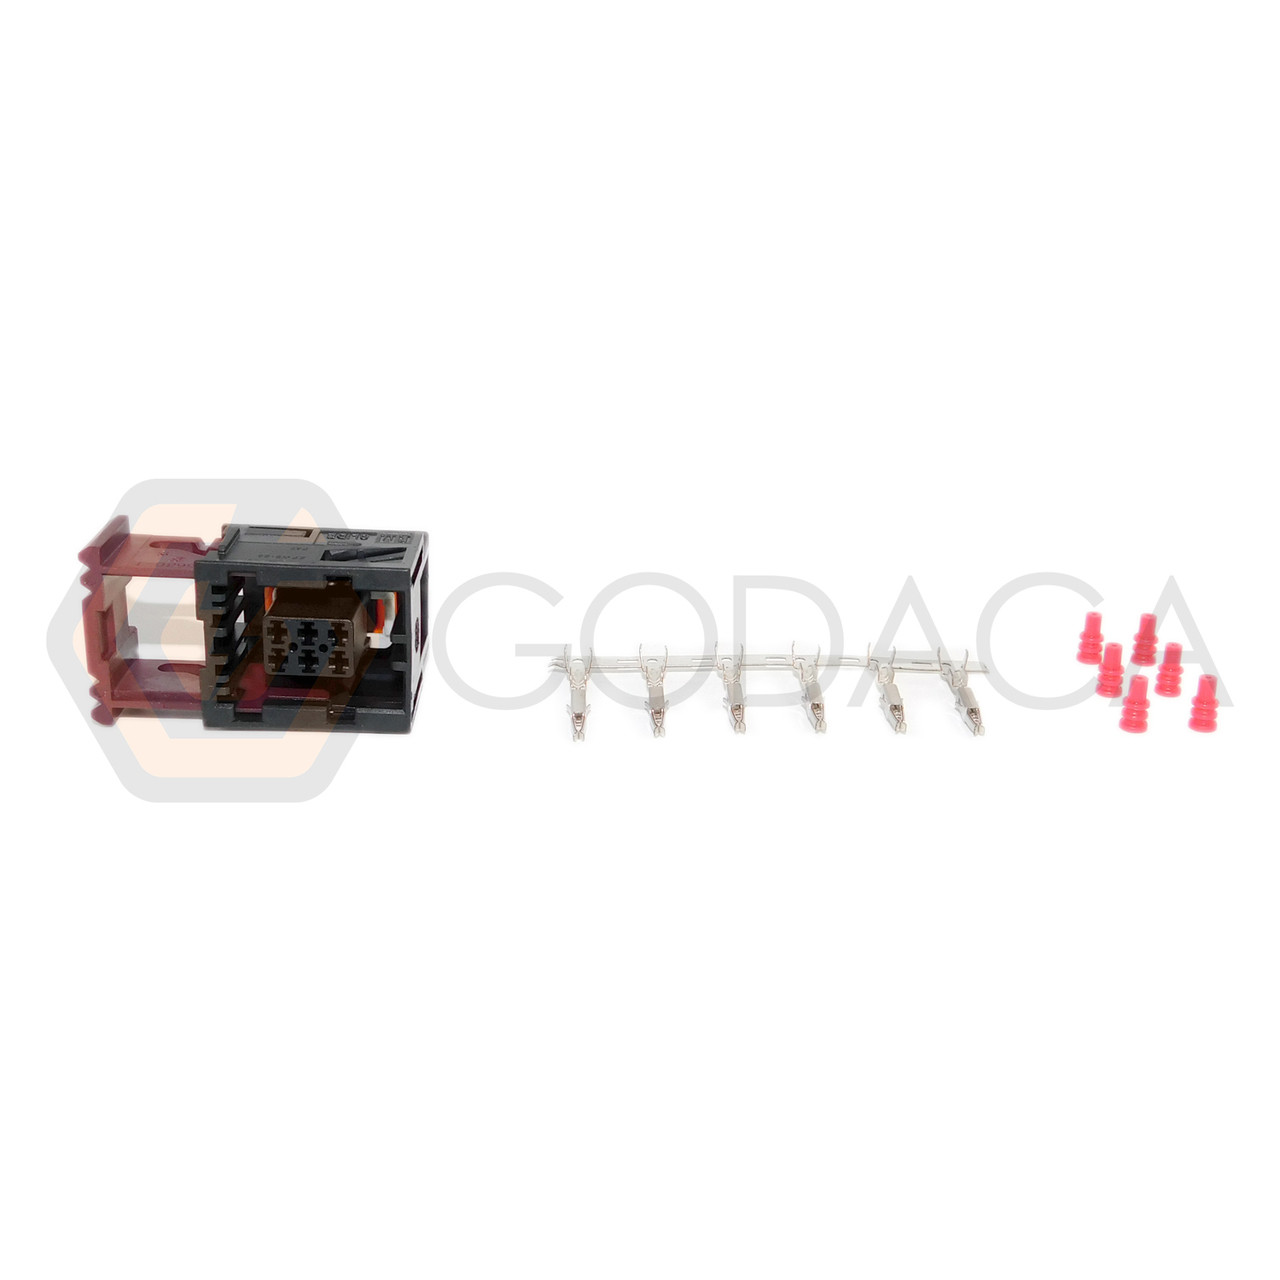 1x connector 6 way 6 pin for gm door lock actuator 88986251 w out wire godaca llc  [ 1280 x 1280 Pixel ]